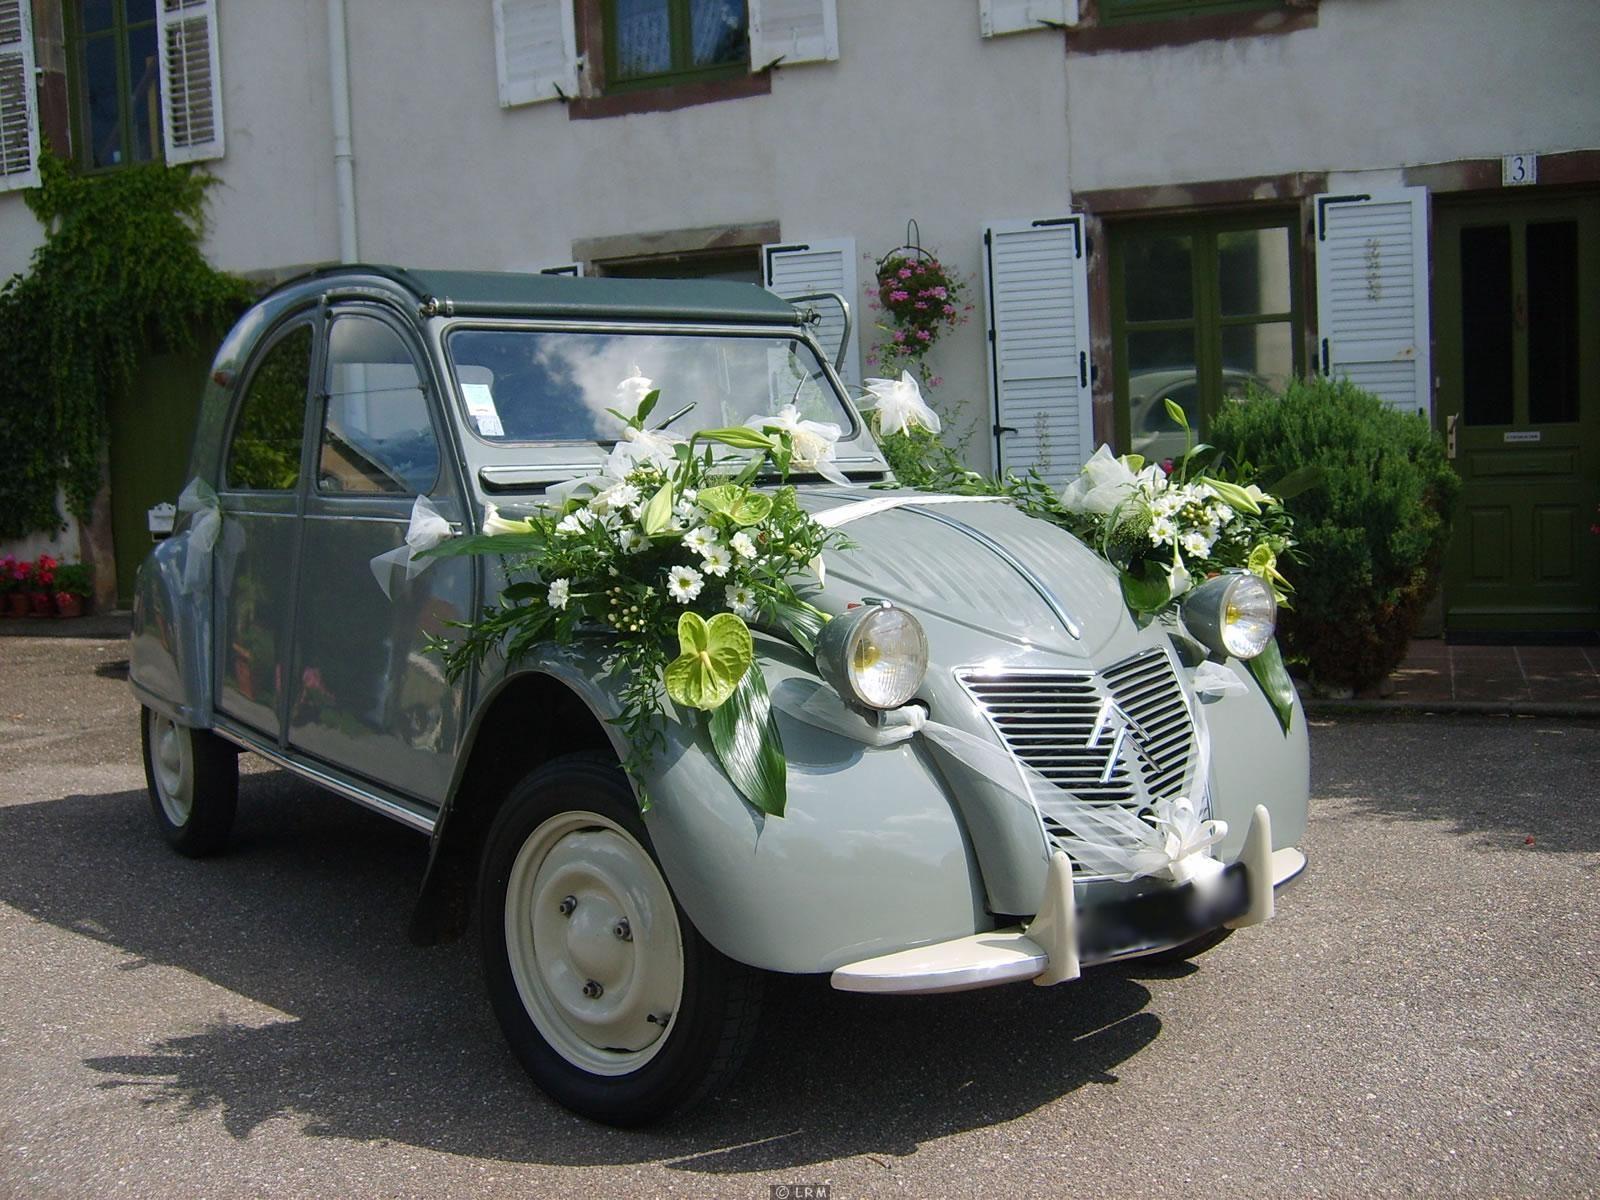 Mariage - Decoration voiture mariage ventouse ...